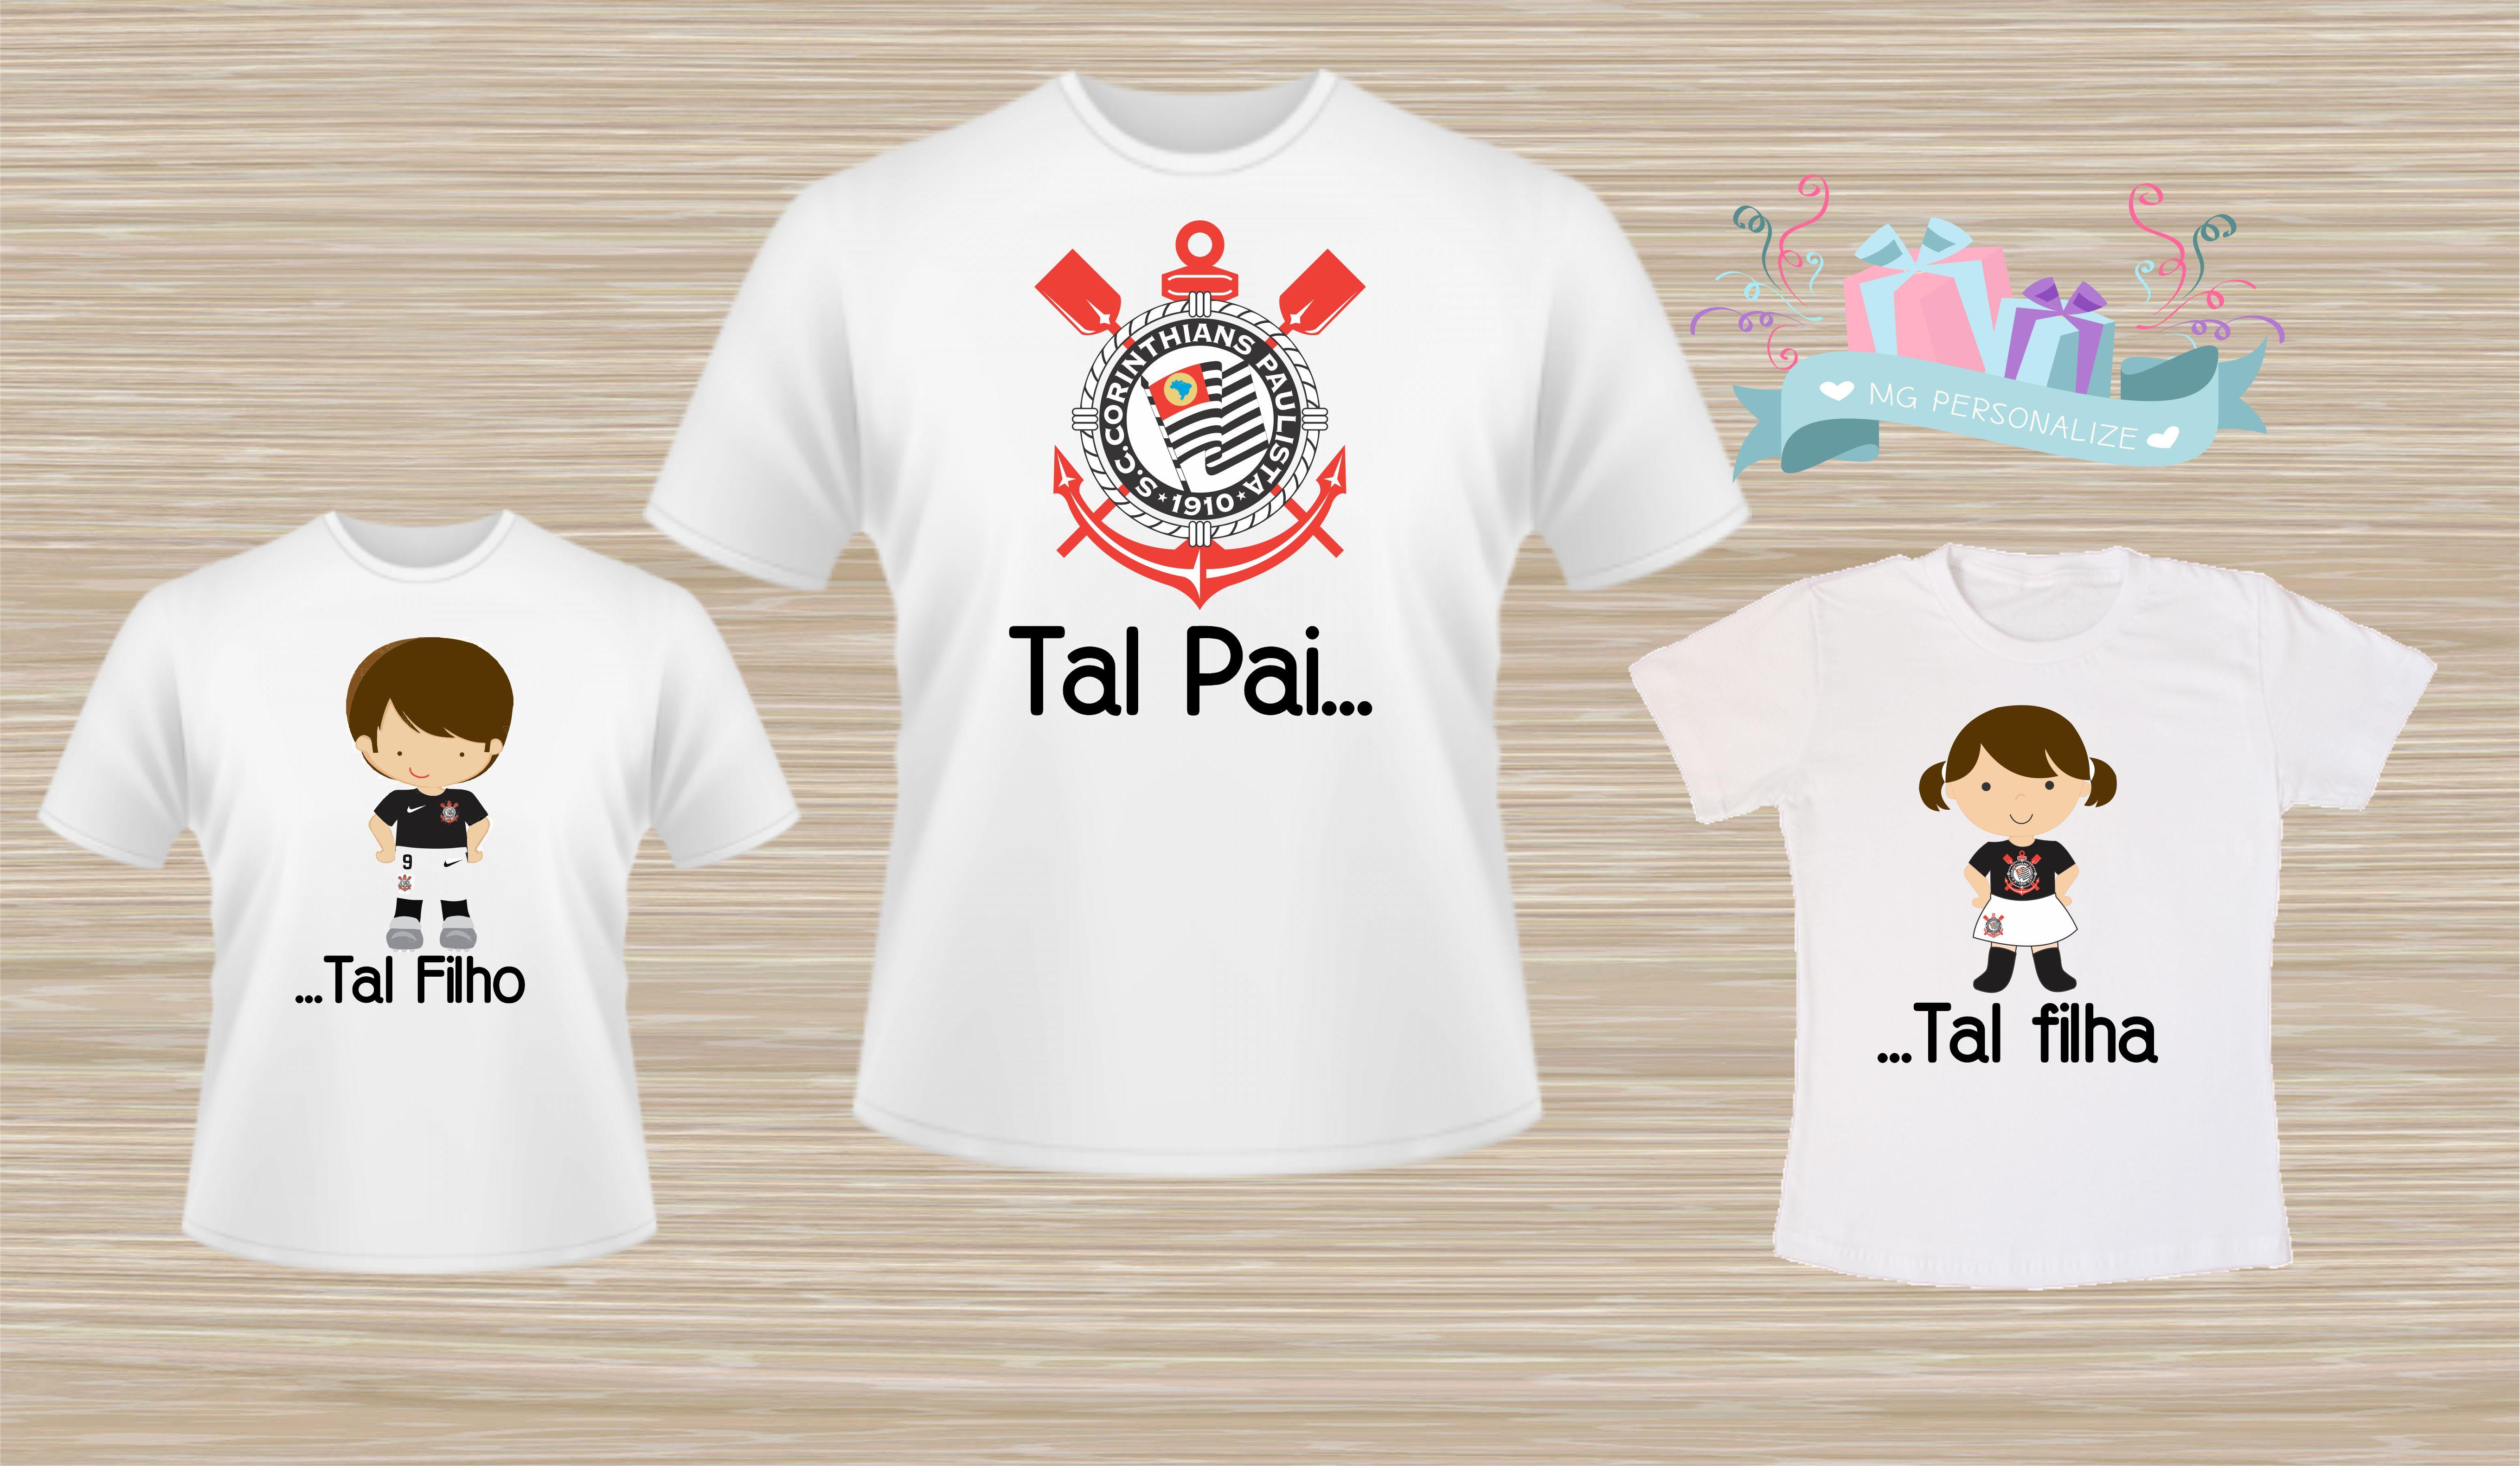 6453541fb3f29b Camiseta Tal Pai Tal Filho Filha   Elo7